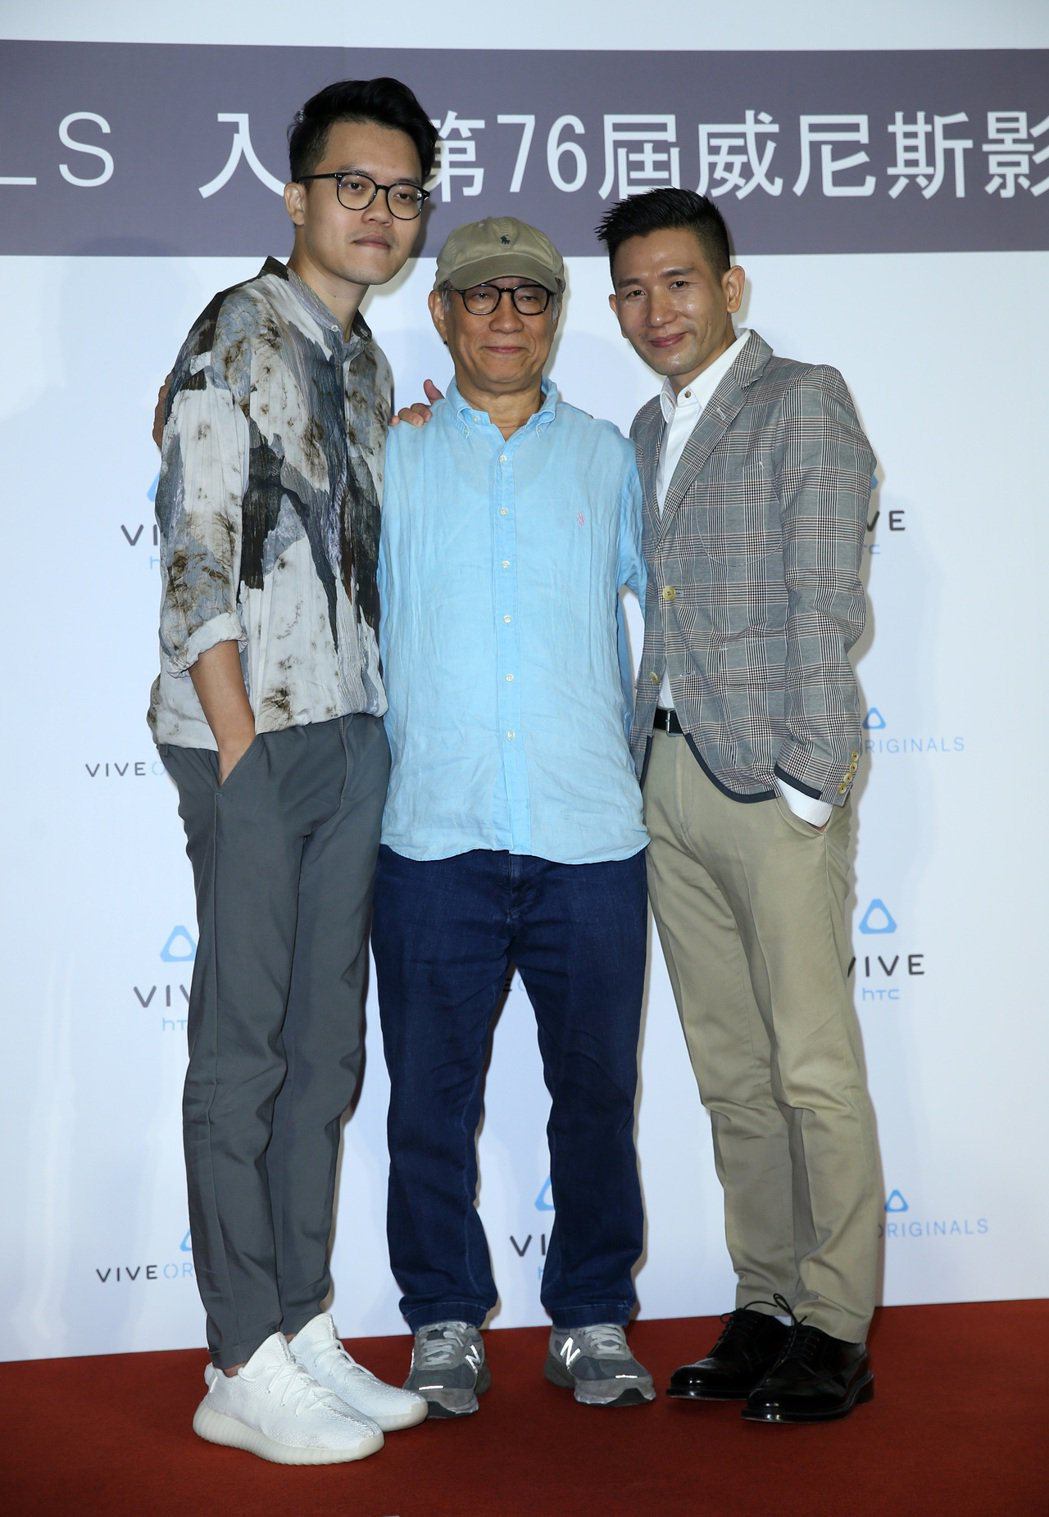 HTC威尼斯影展慶功記者會,曾威量(左起)、廖慶松、趙德胤出席。記者曾吉松/攝影